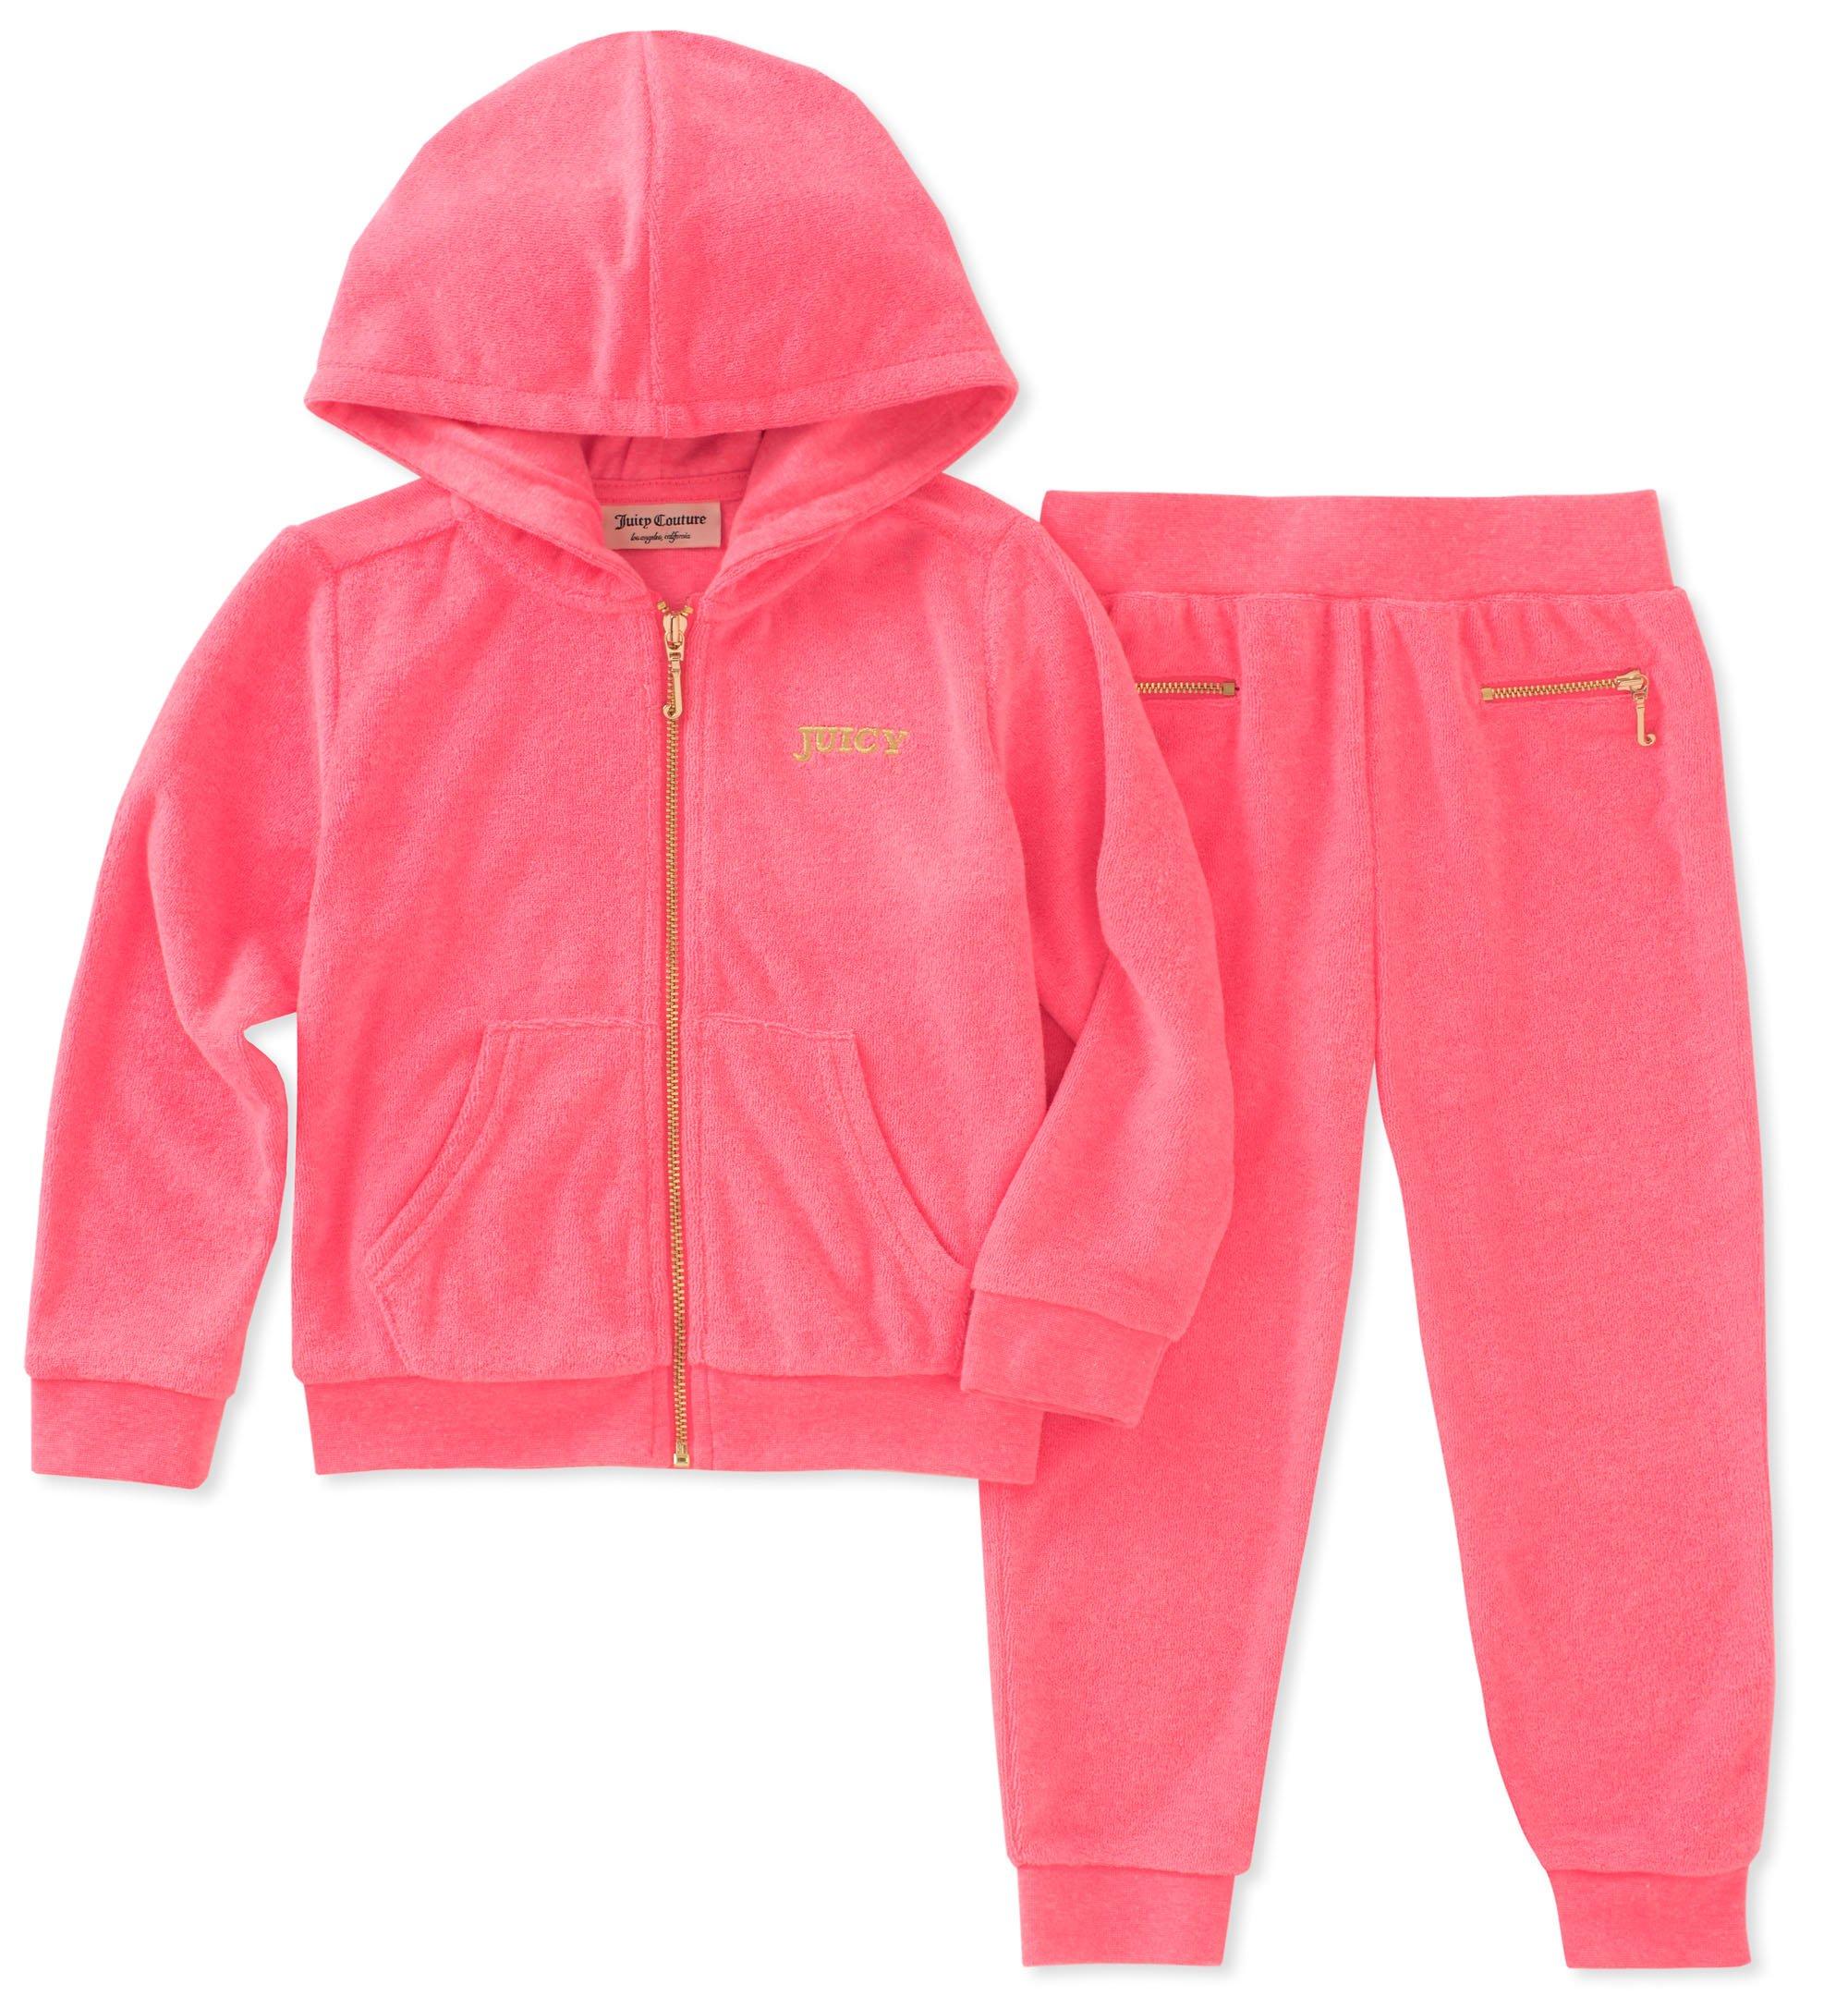 Juicy Couture Girls' Little 2 Pieces Jog Set, Pink, 6